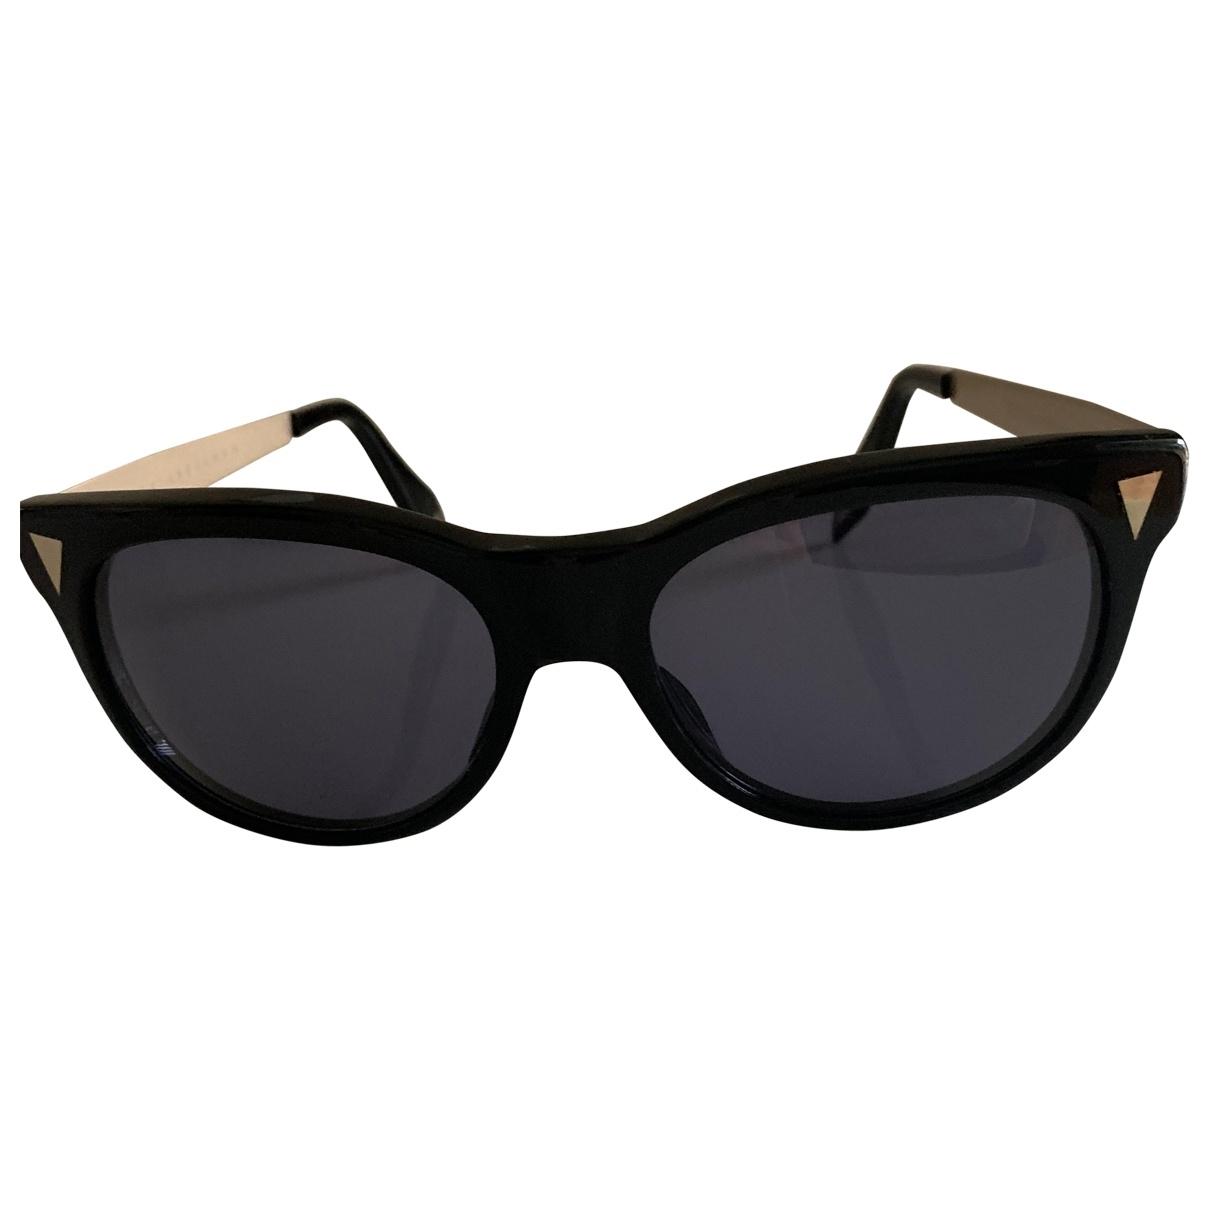 Victoria Beckham \N Black Sunglasses for Women \N